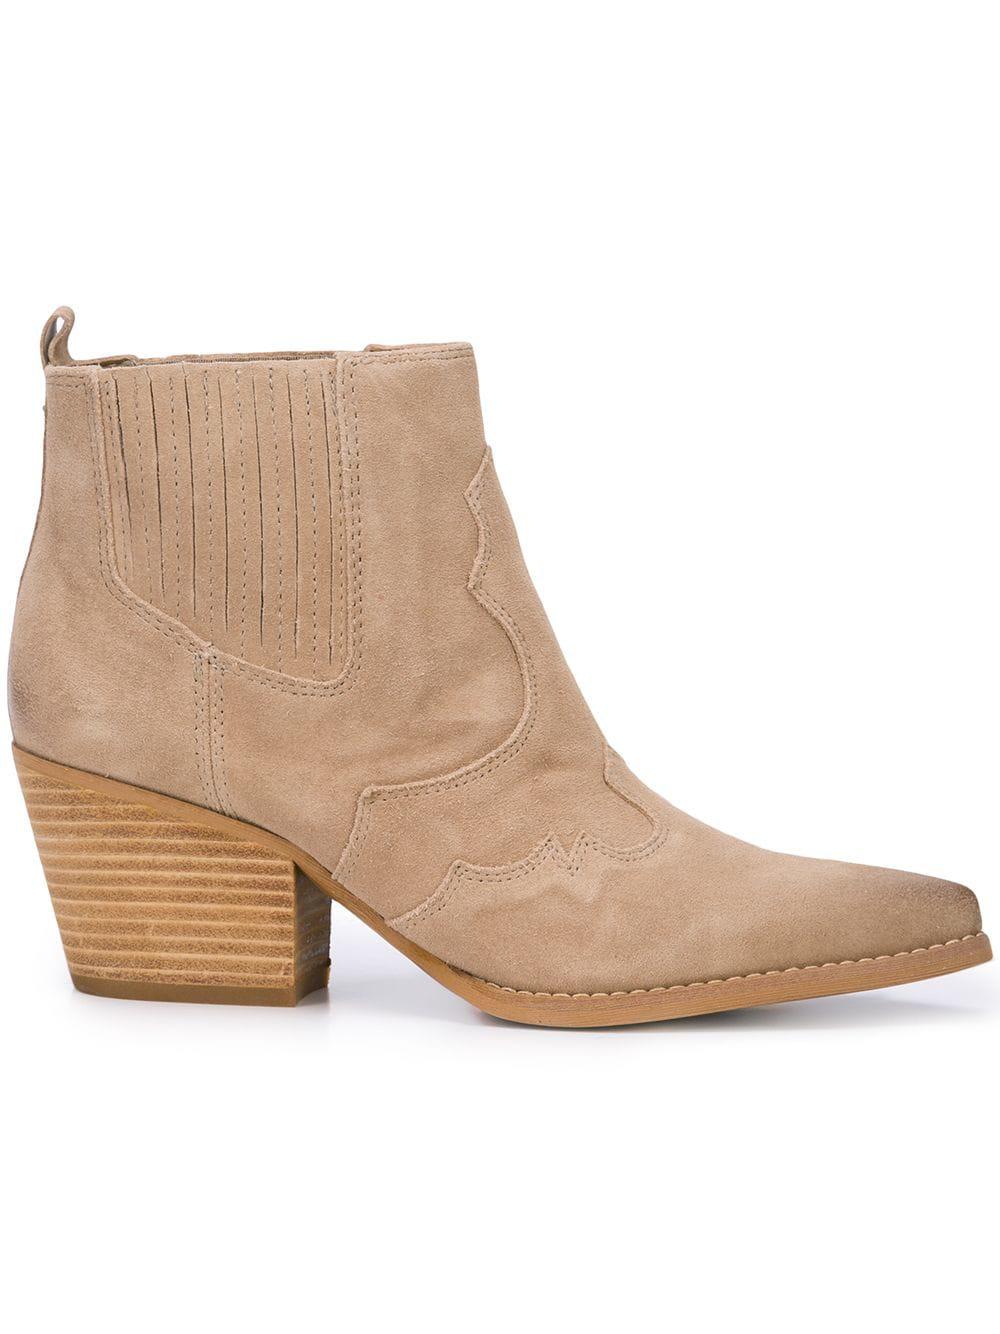 6171d54a4 Sam Edelman Winona Western Boots - Neutrals